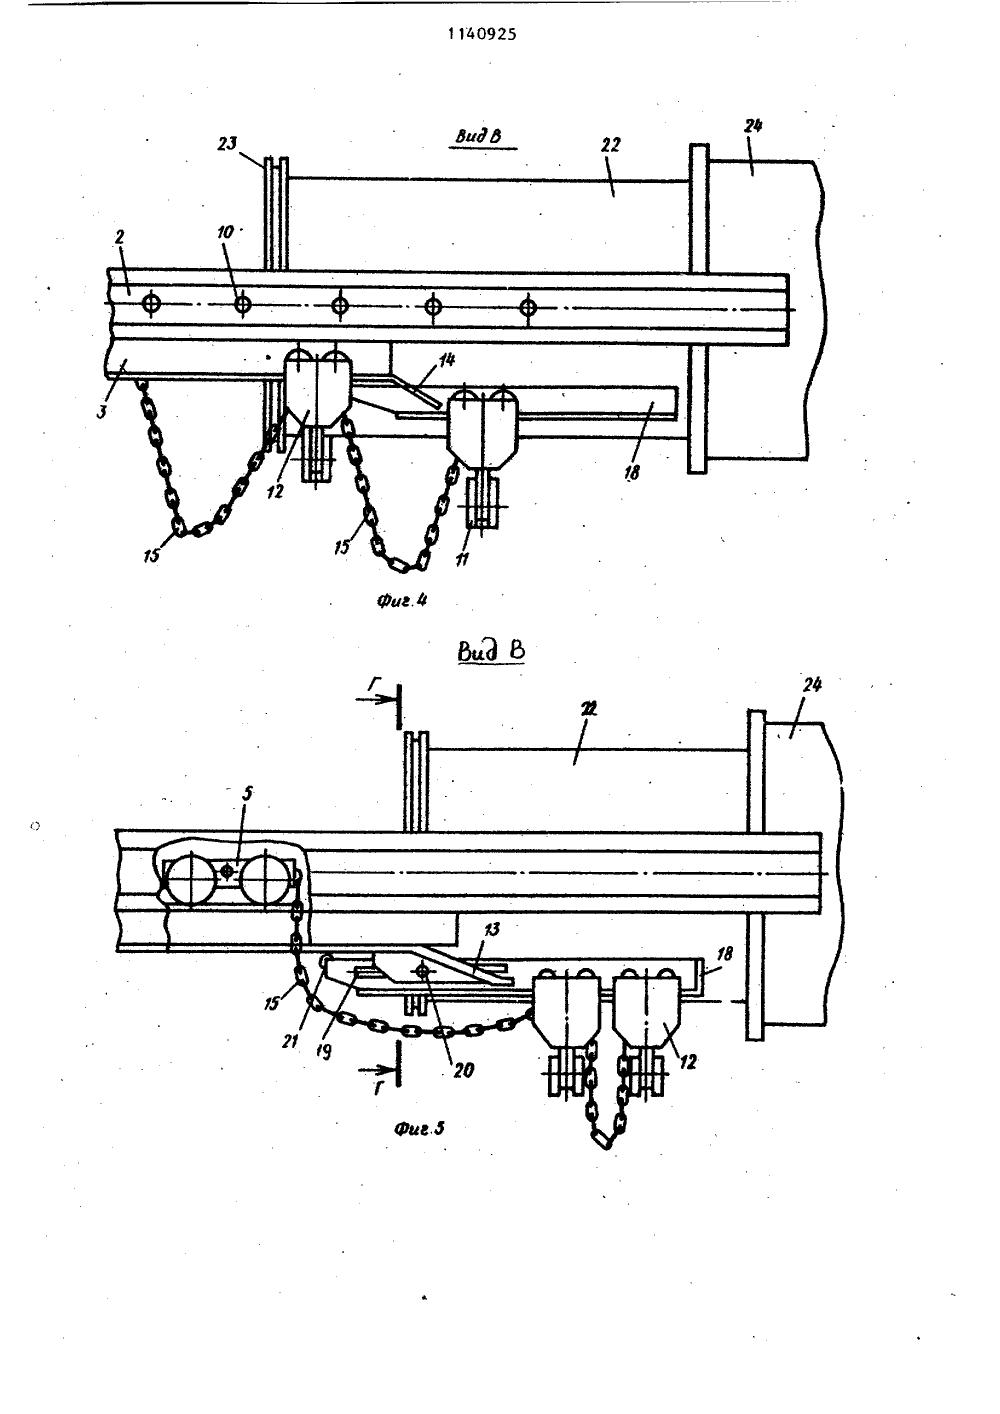 Монтаж трубного пучка в корпус теплообменника Уплотнения теплообменника Alfa Laval AQ10-FGS Петрозаводск